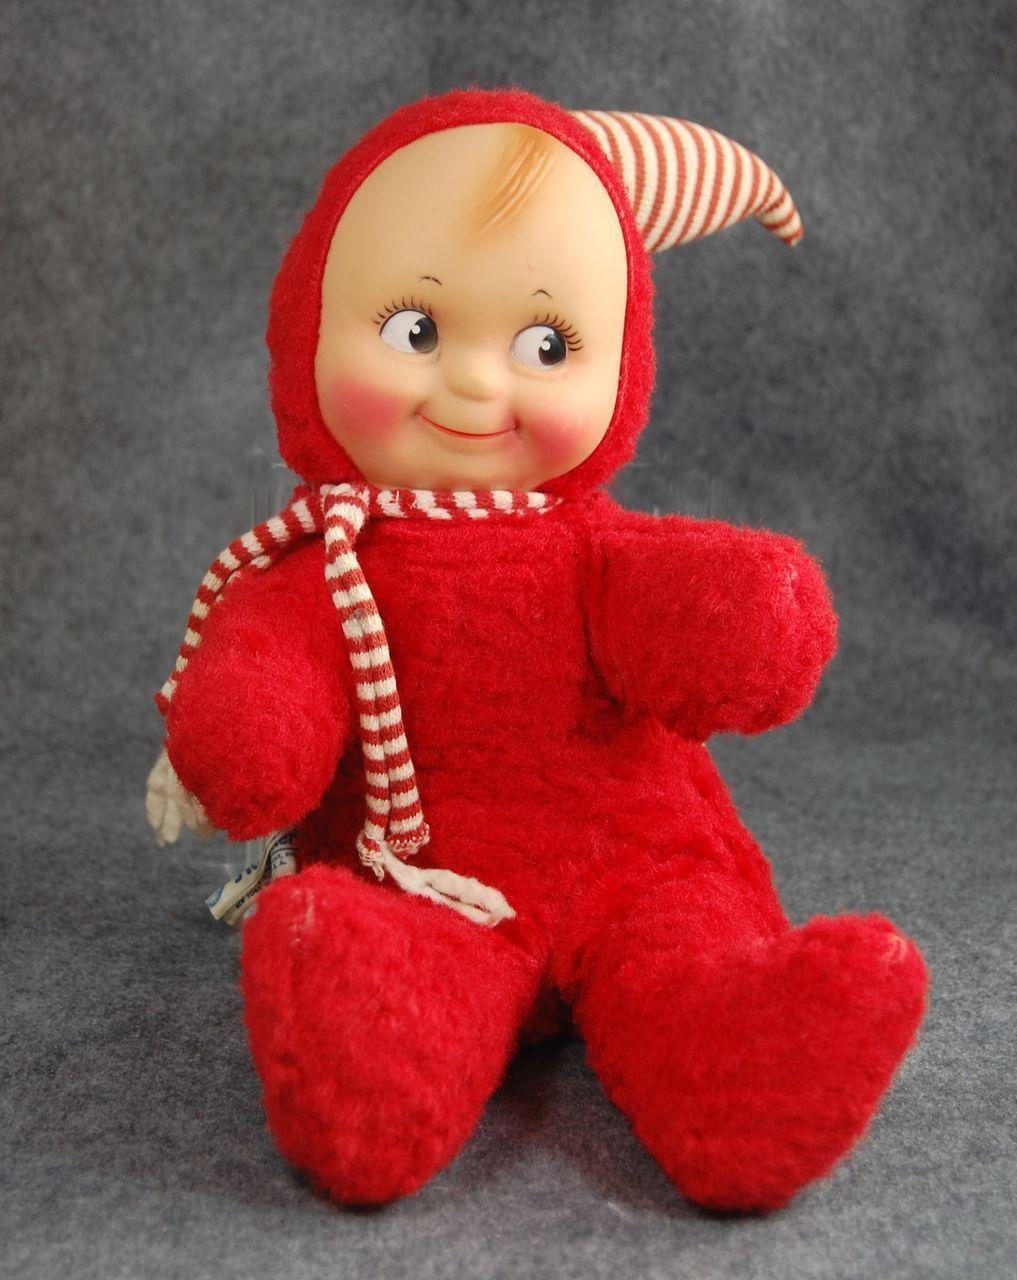 Knickerbocker Kewpie Doll Vinyl Face Red Plush Musical 12